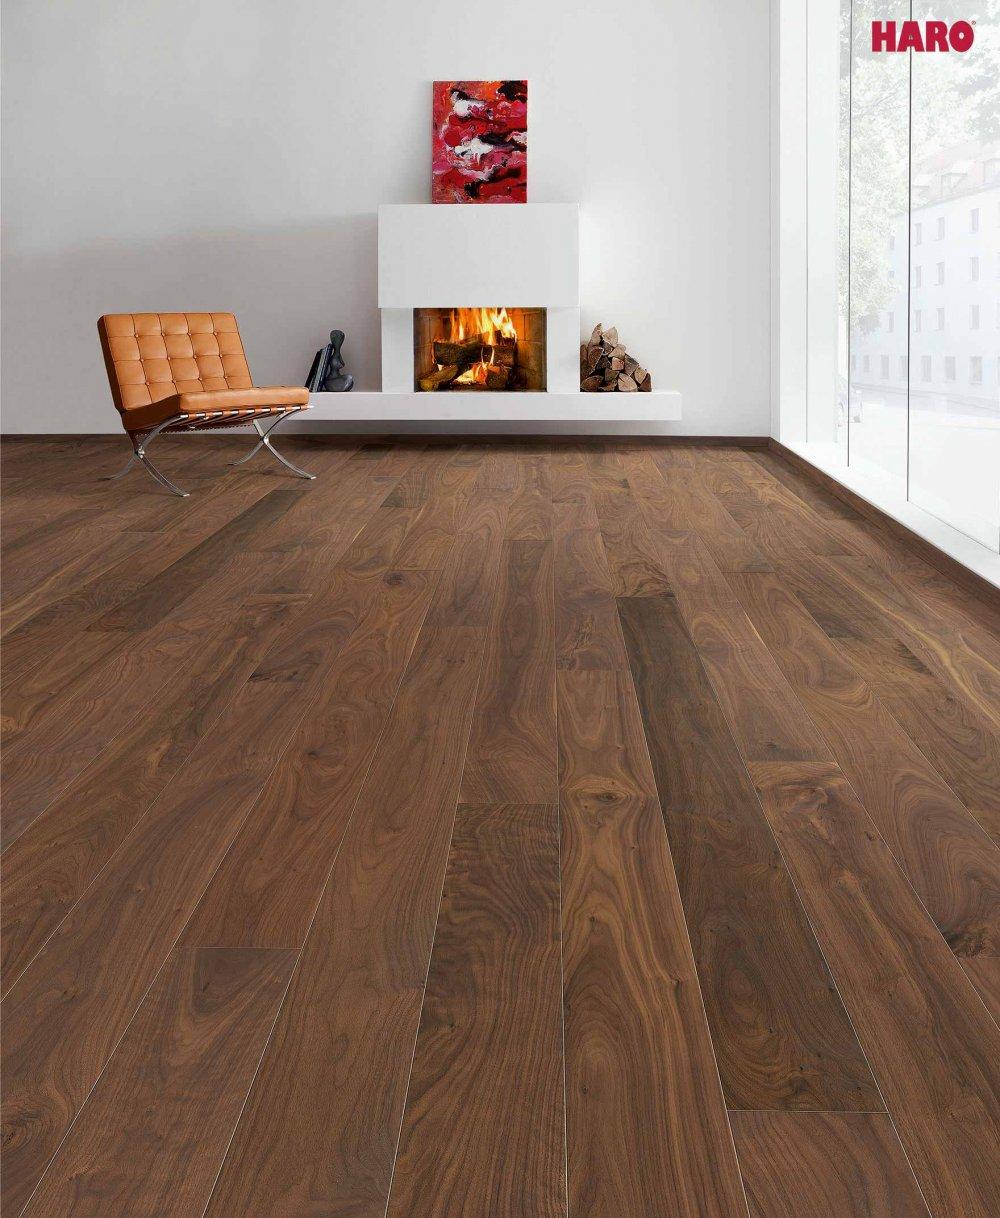 533051 haro parkett landhausdiele 4000 amerikanischer nu baum nussbaum markant natur 4v fase. Black Bedroom Furniture Sets. Home Design Ideas